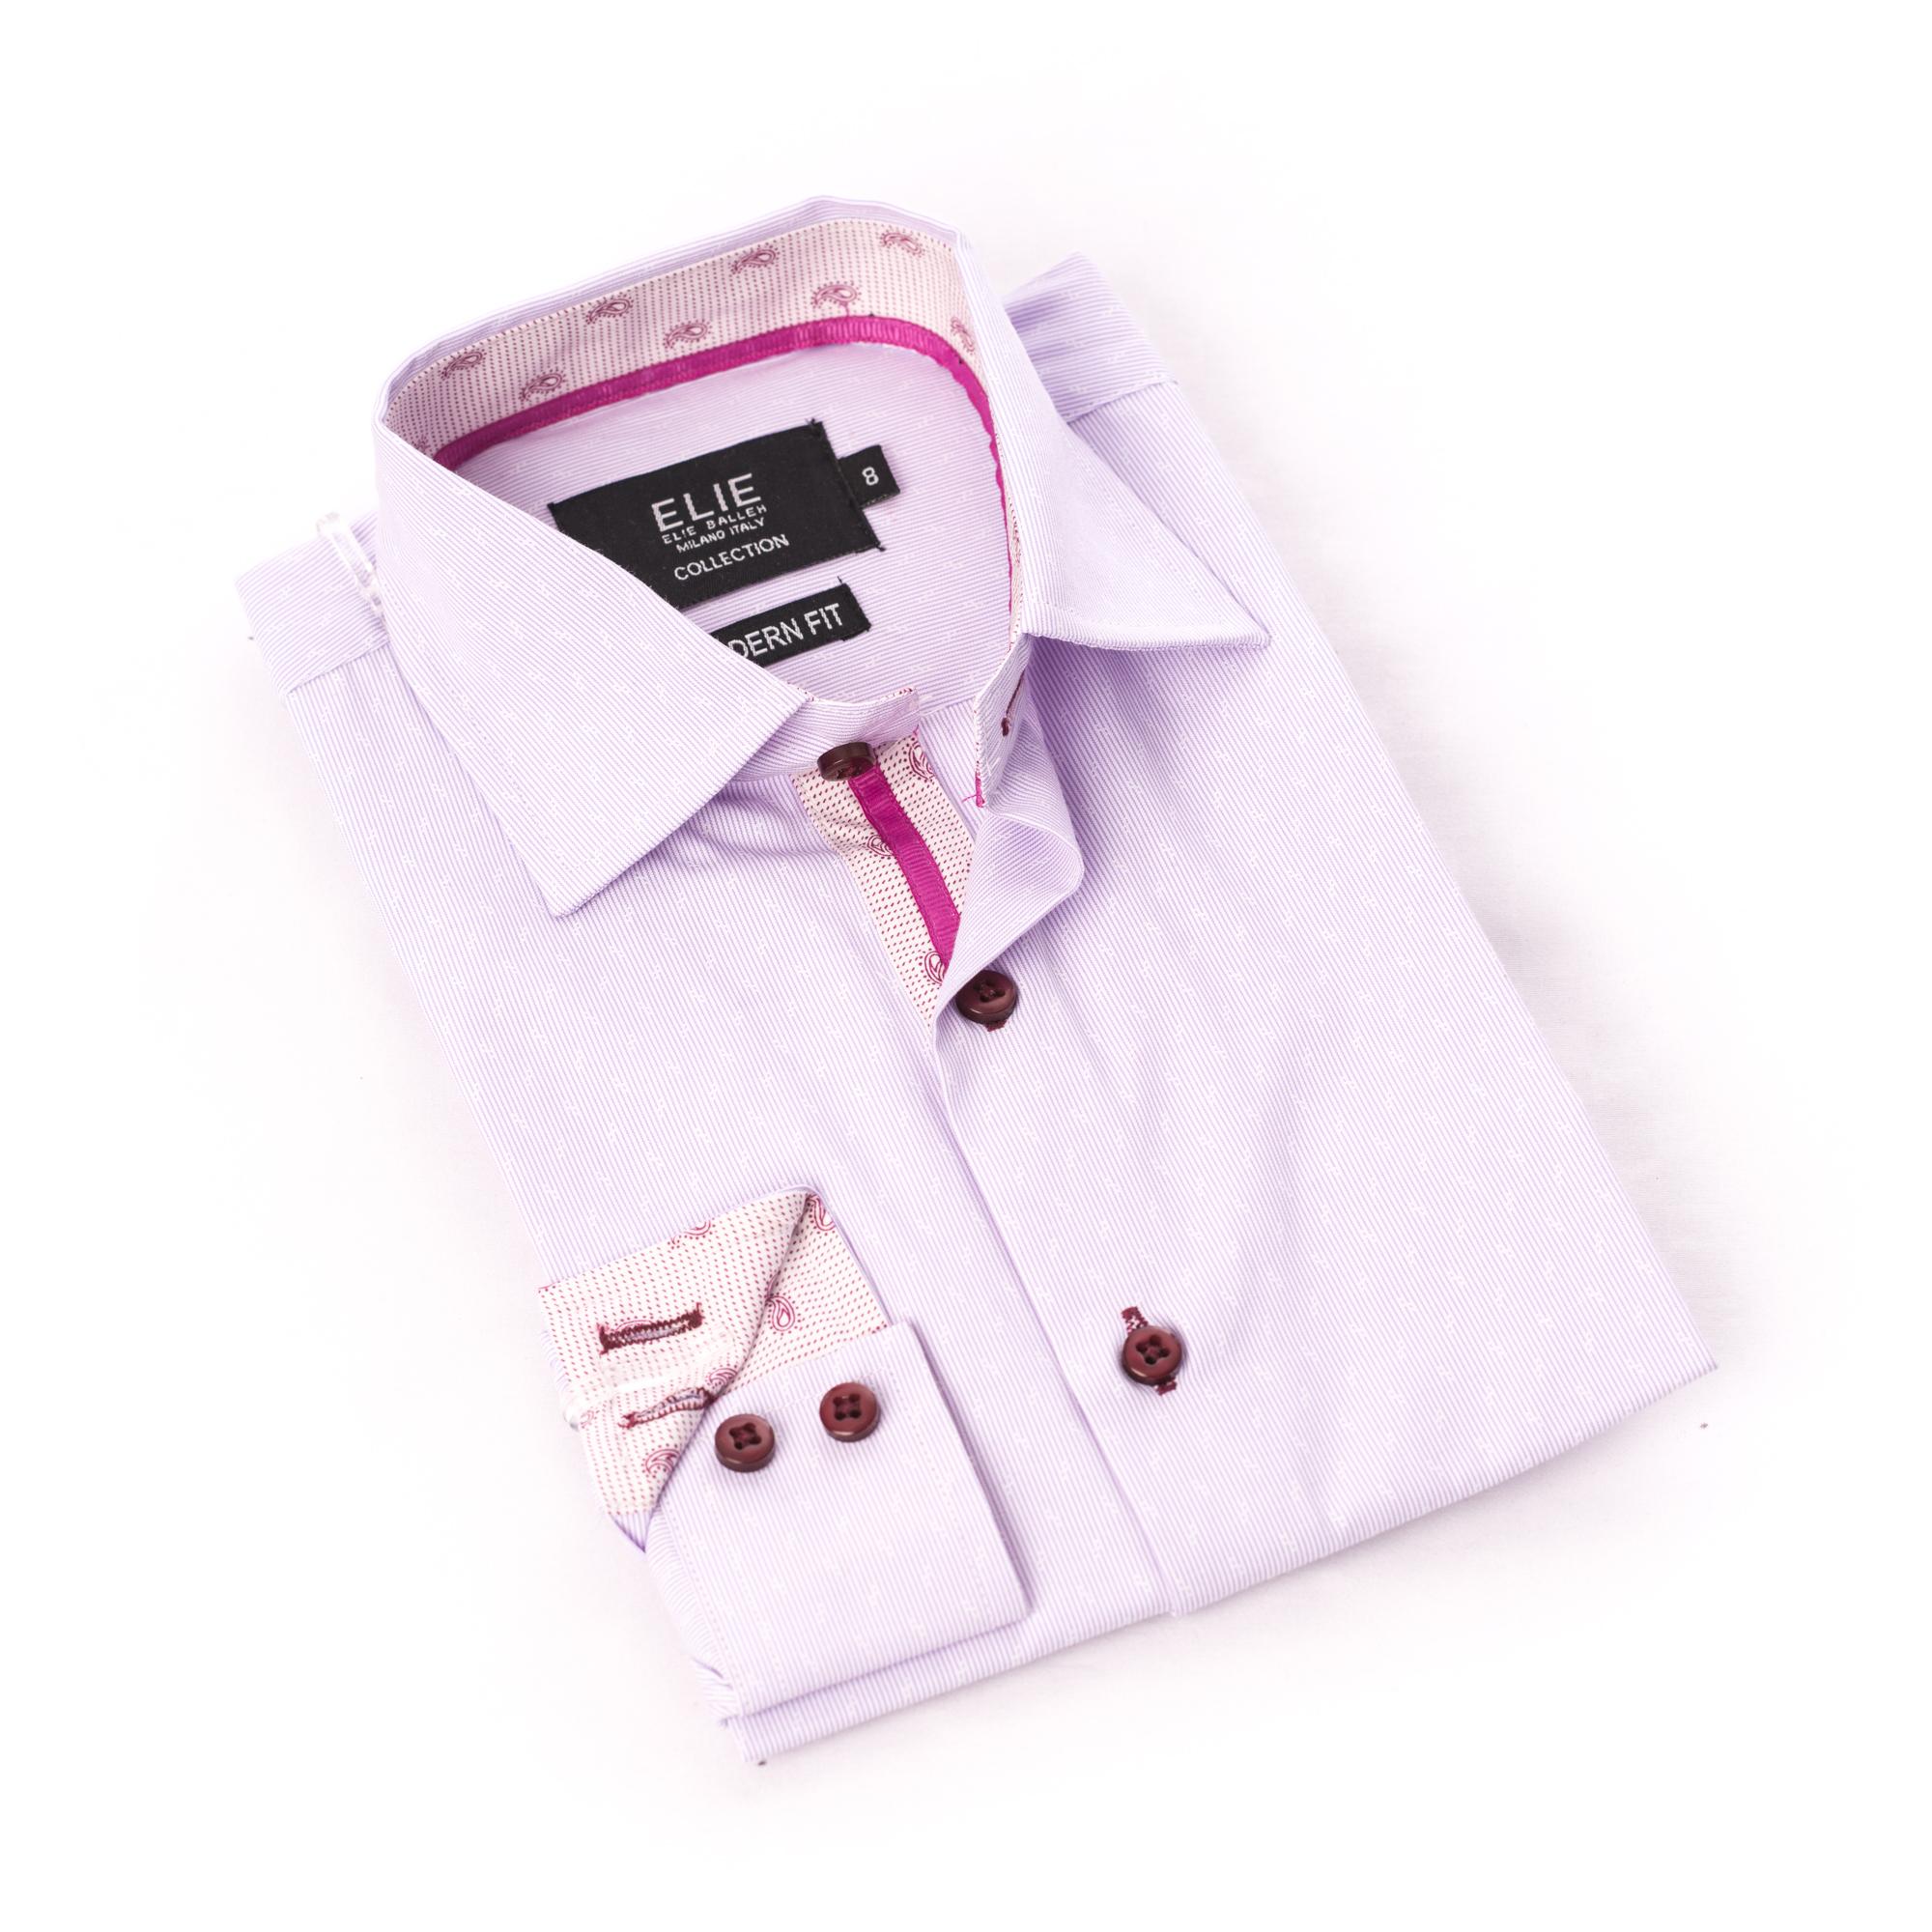 Pinstripe premium Boys Shirts / Button Down CEBSH316B